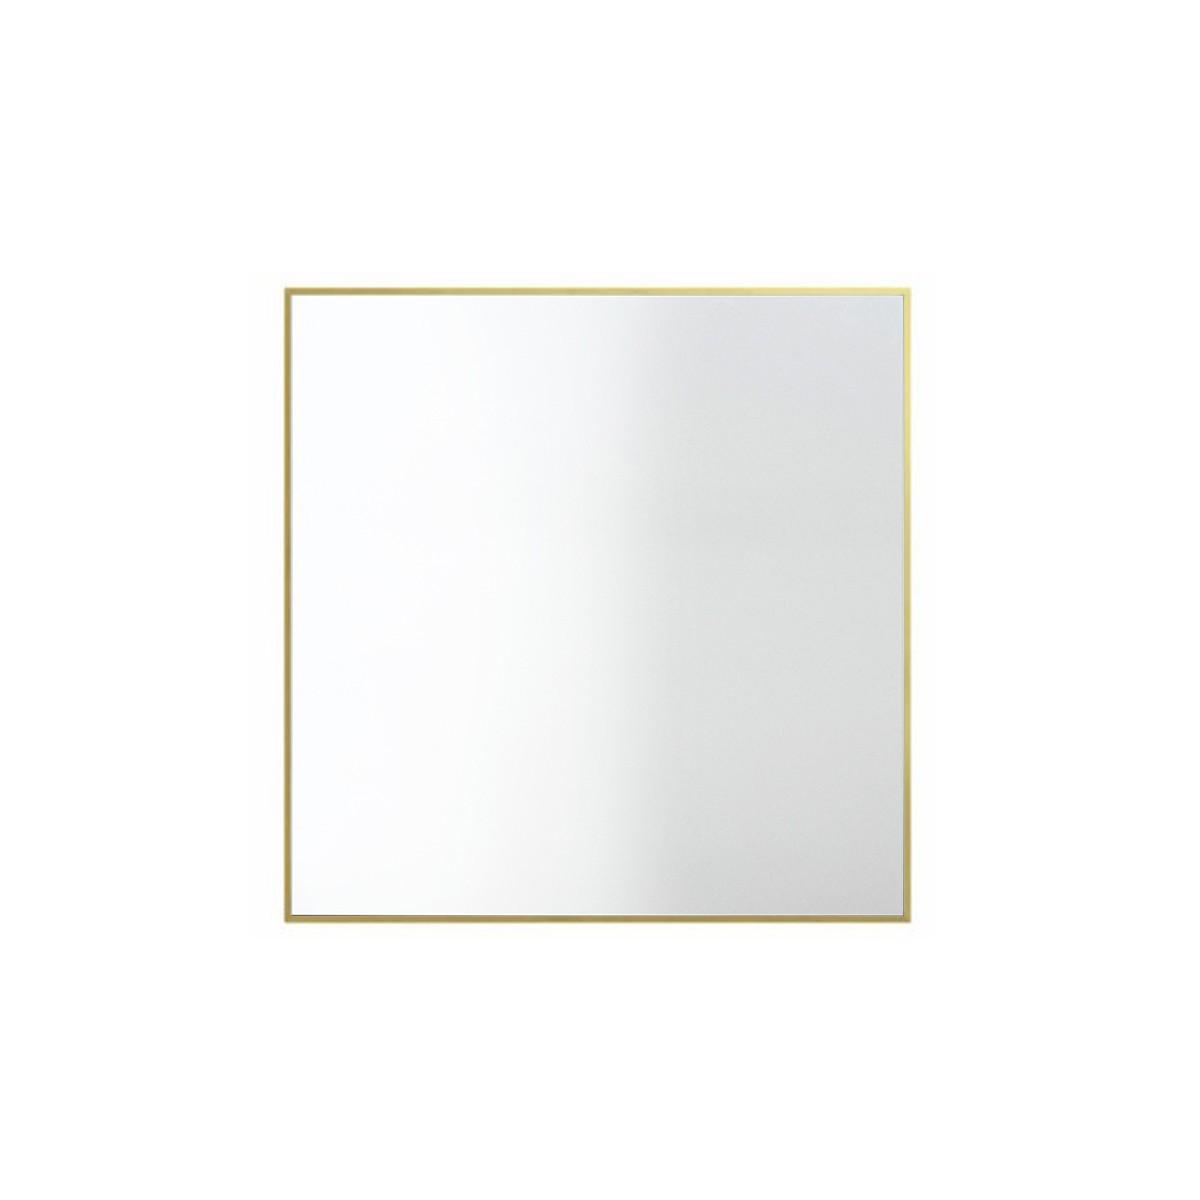 by lassen view spiegel mittel messing wandspiegel 56x56. Black Bedroom Furniture Sets. Home Design Ideas